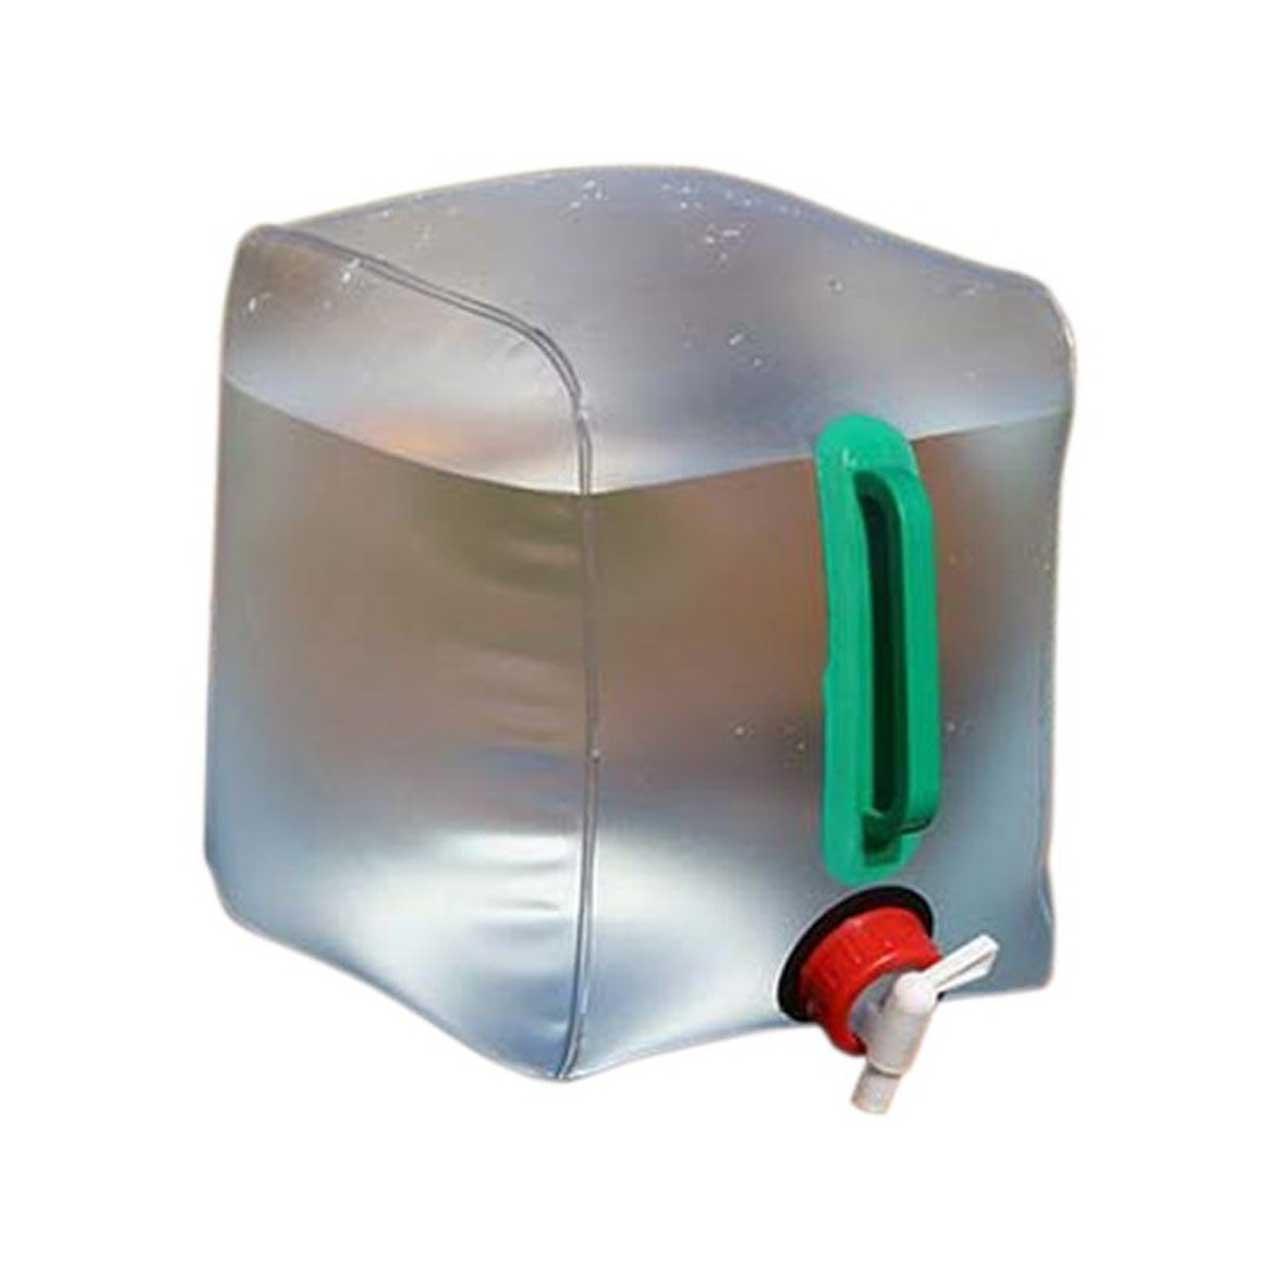 مخزن آب تاشو مدل 01 حجم 10 ليتر